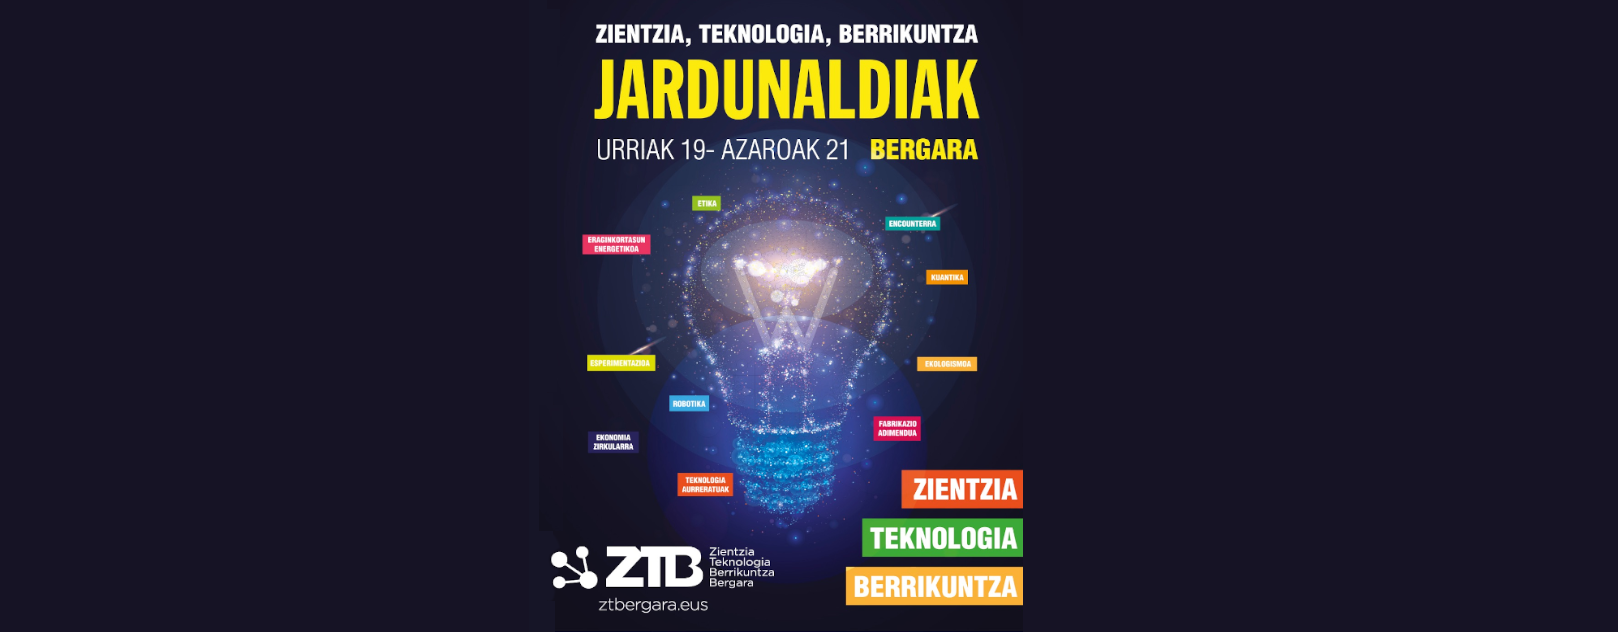 ztb-2021.png